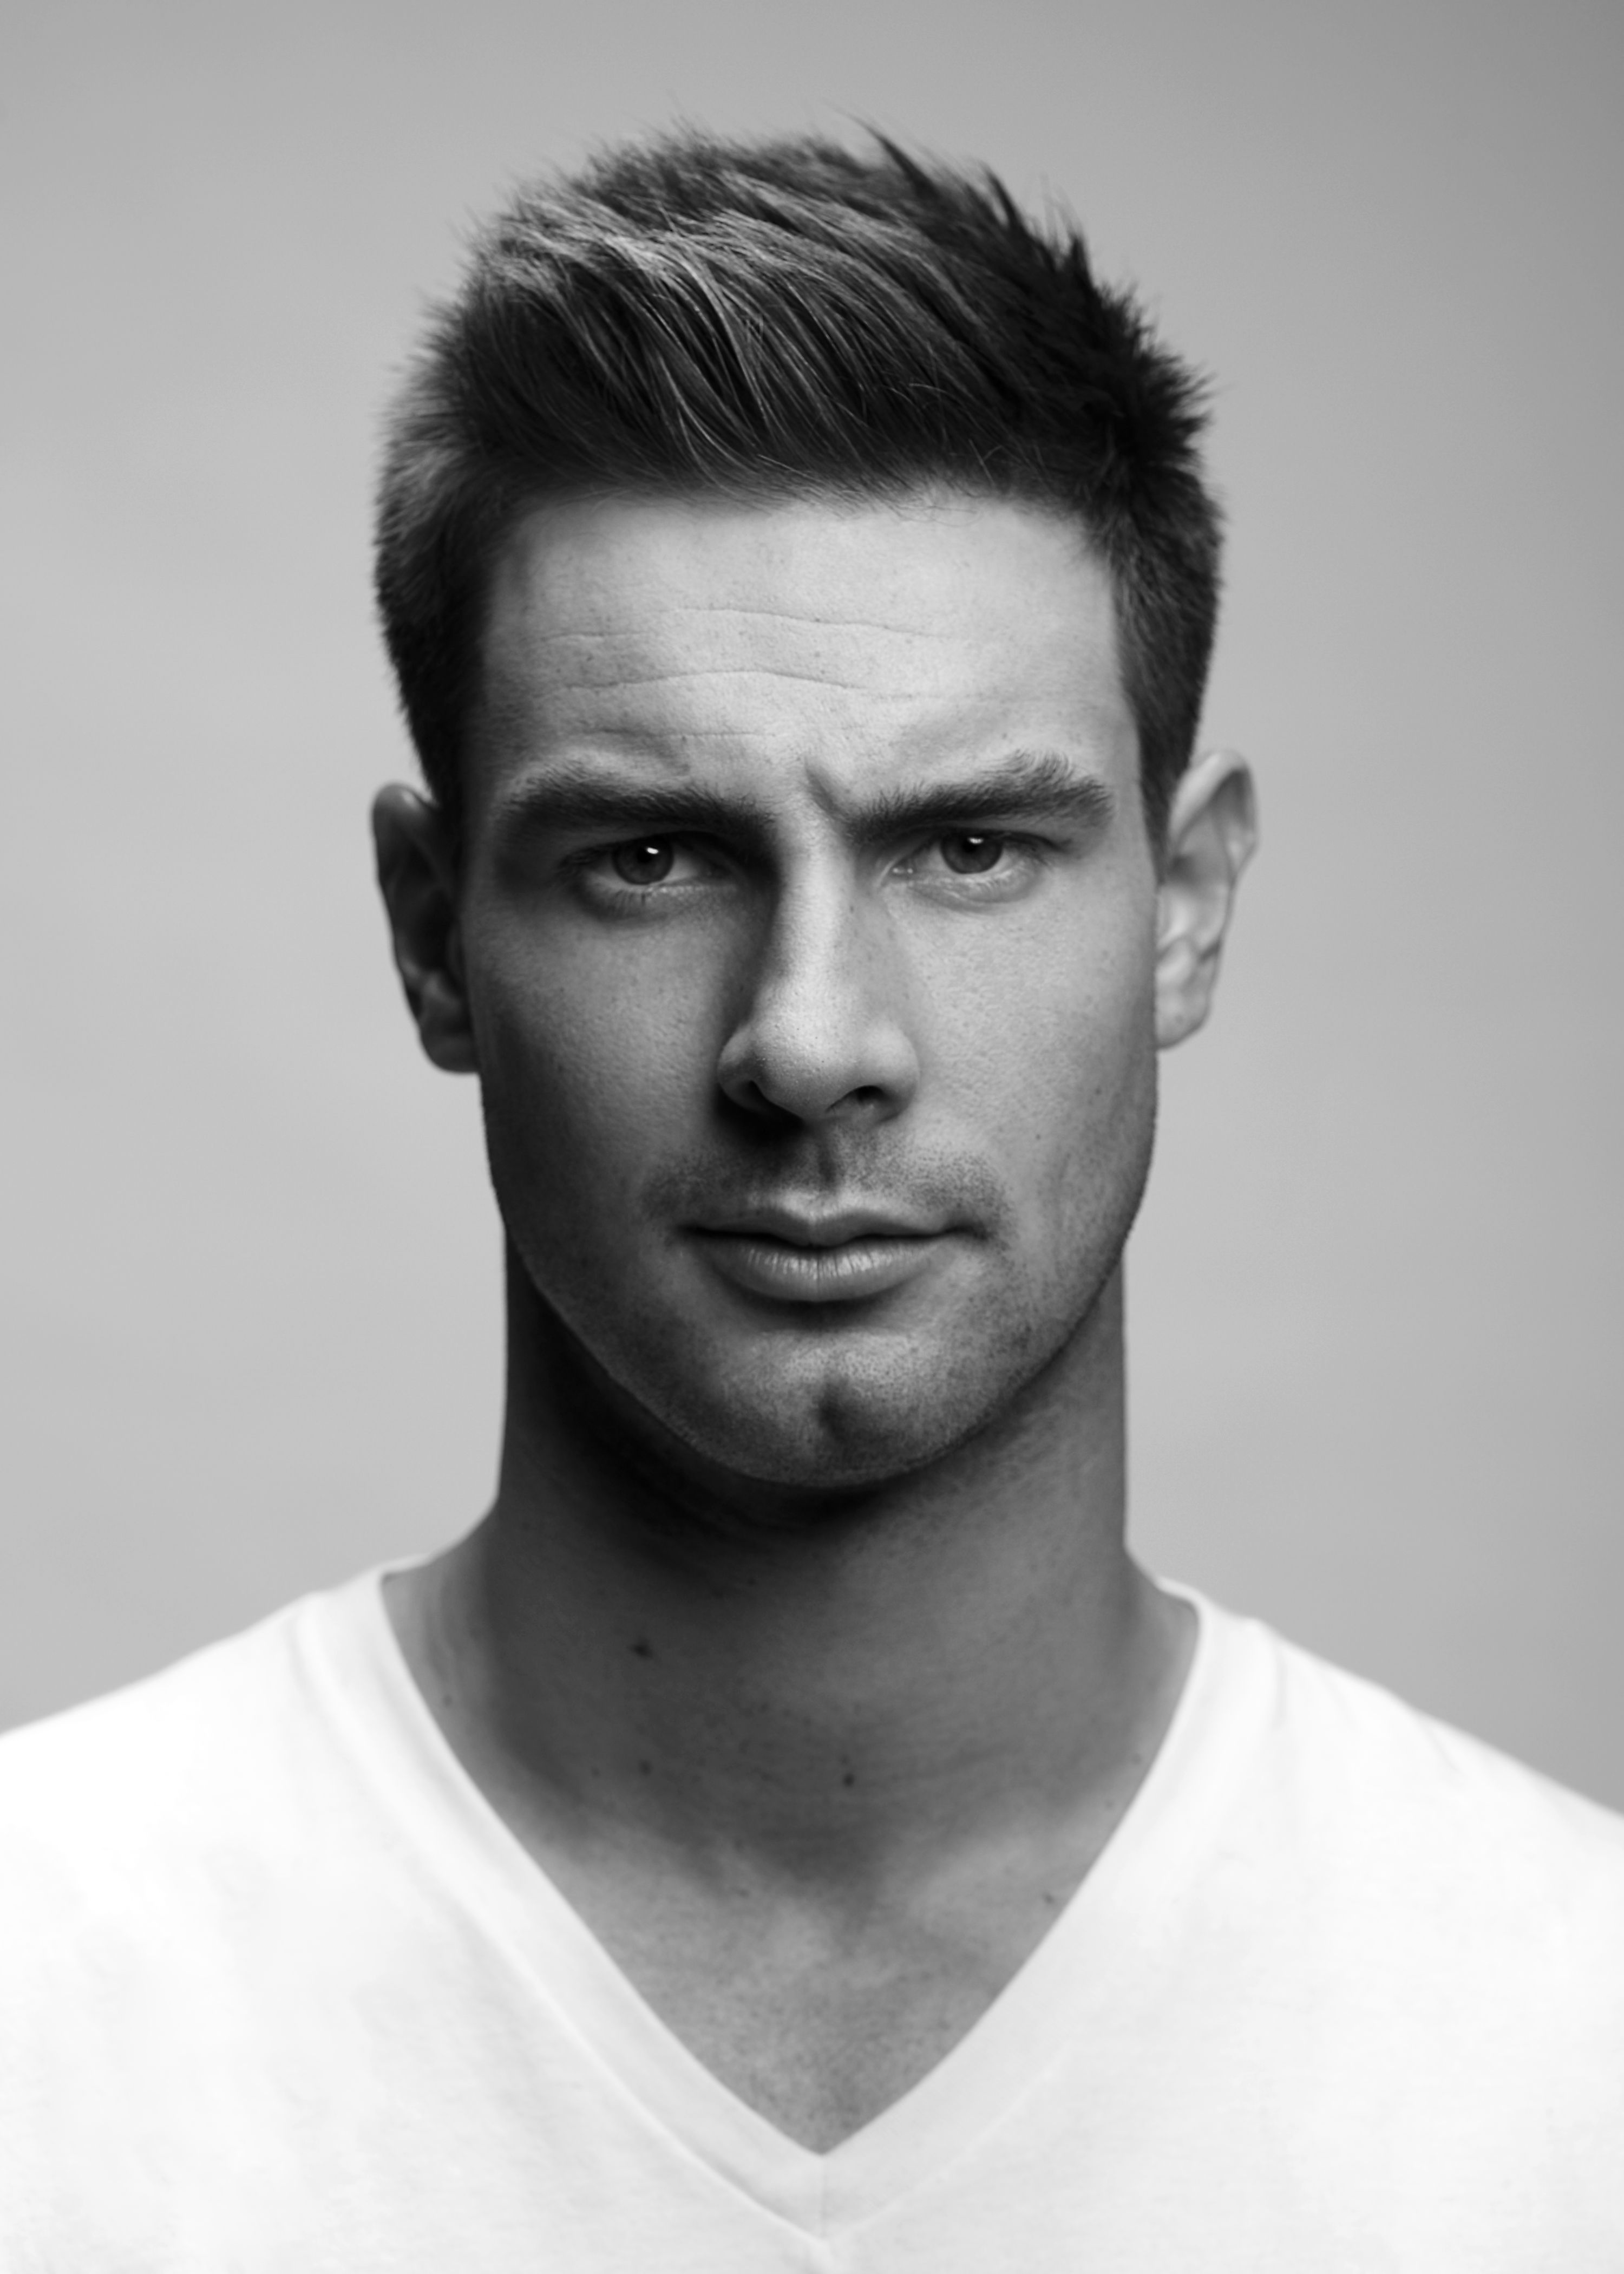 Haircuts for round faces men men hairstyles  frisuren  pinterest  men hairstyles hair cuts